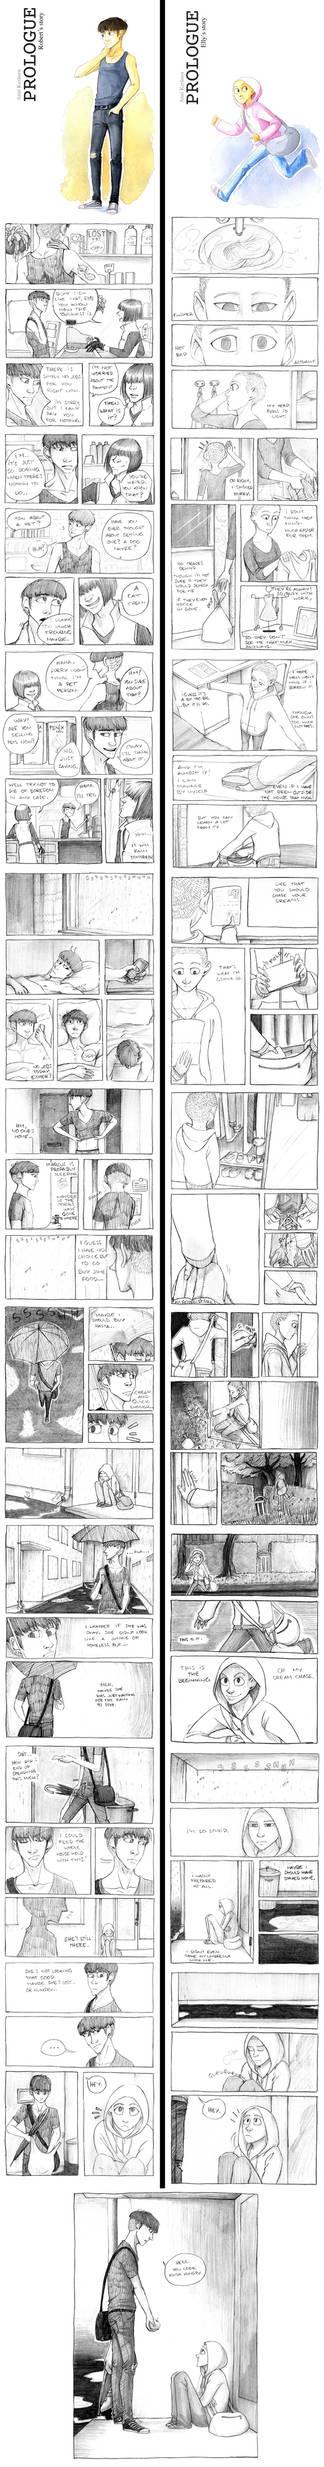 Hideout 6 Prologue comics